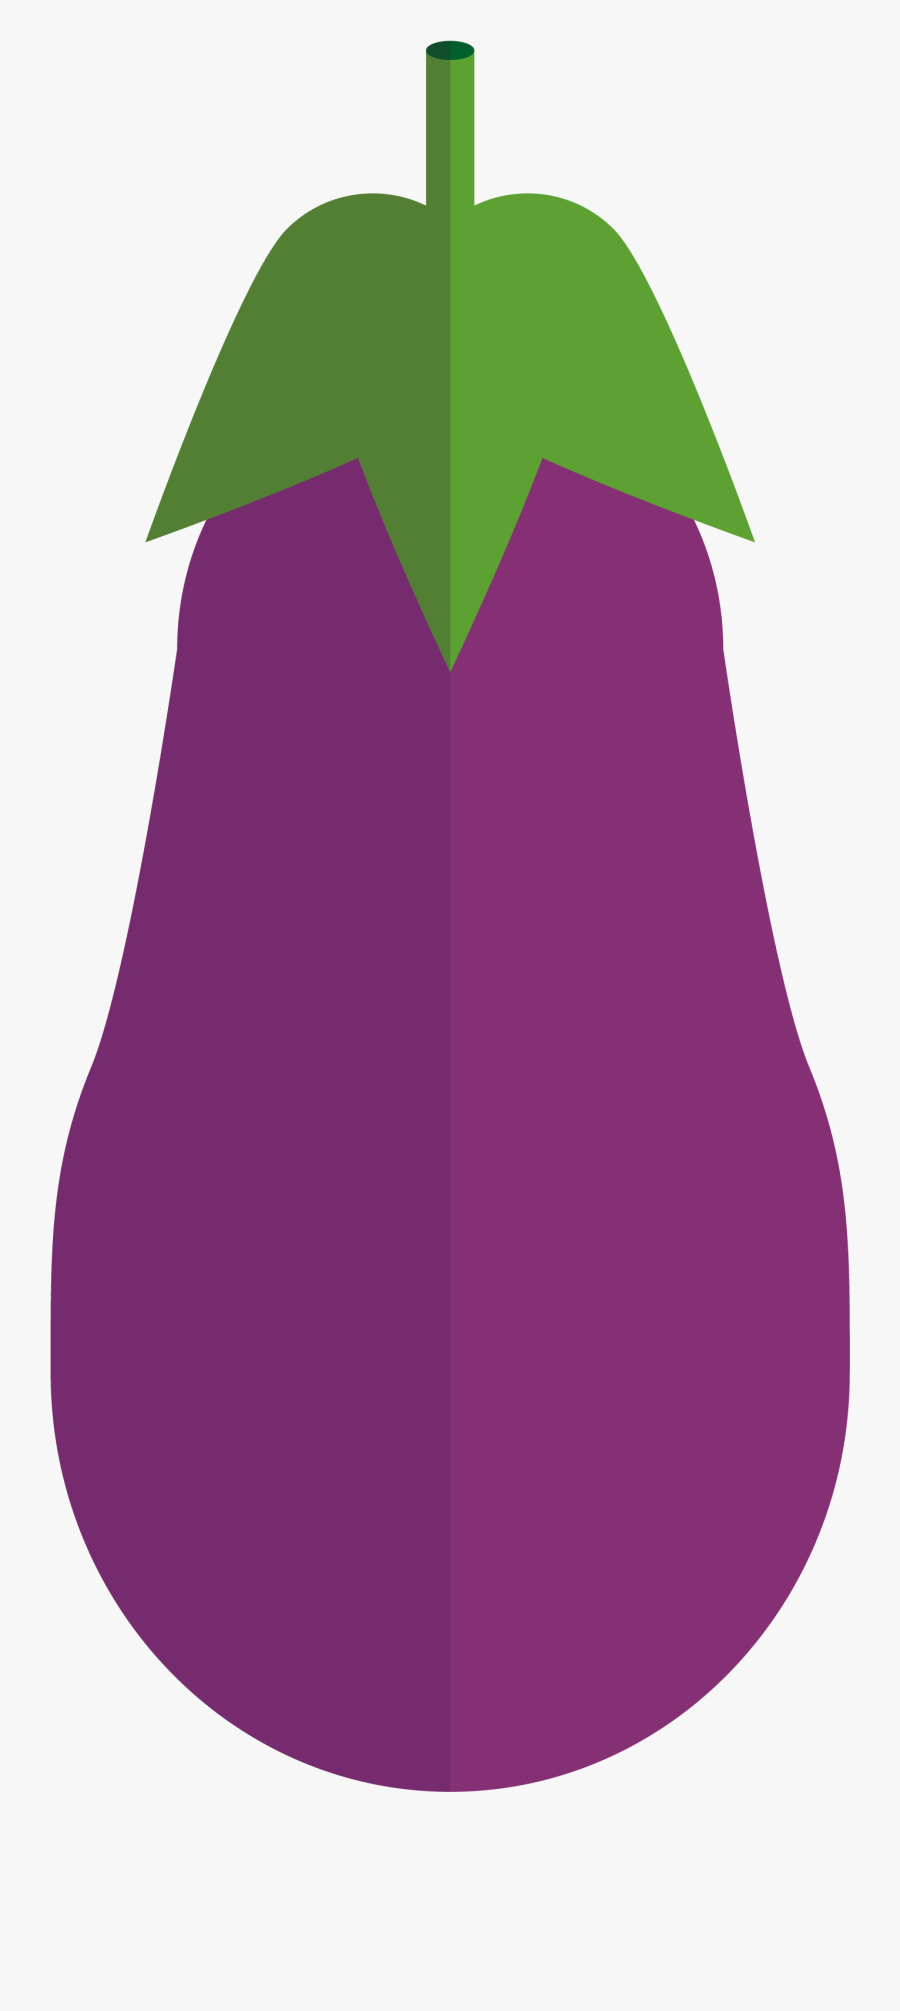 Eggplant Clipart , Png Download - Eggplant Drswing, Transparent Clipart